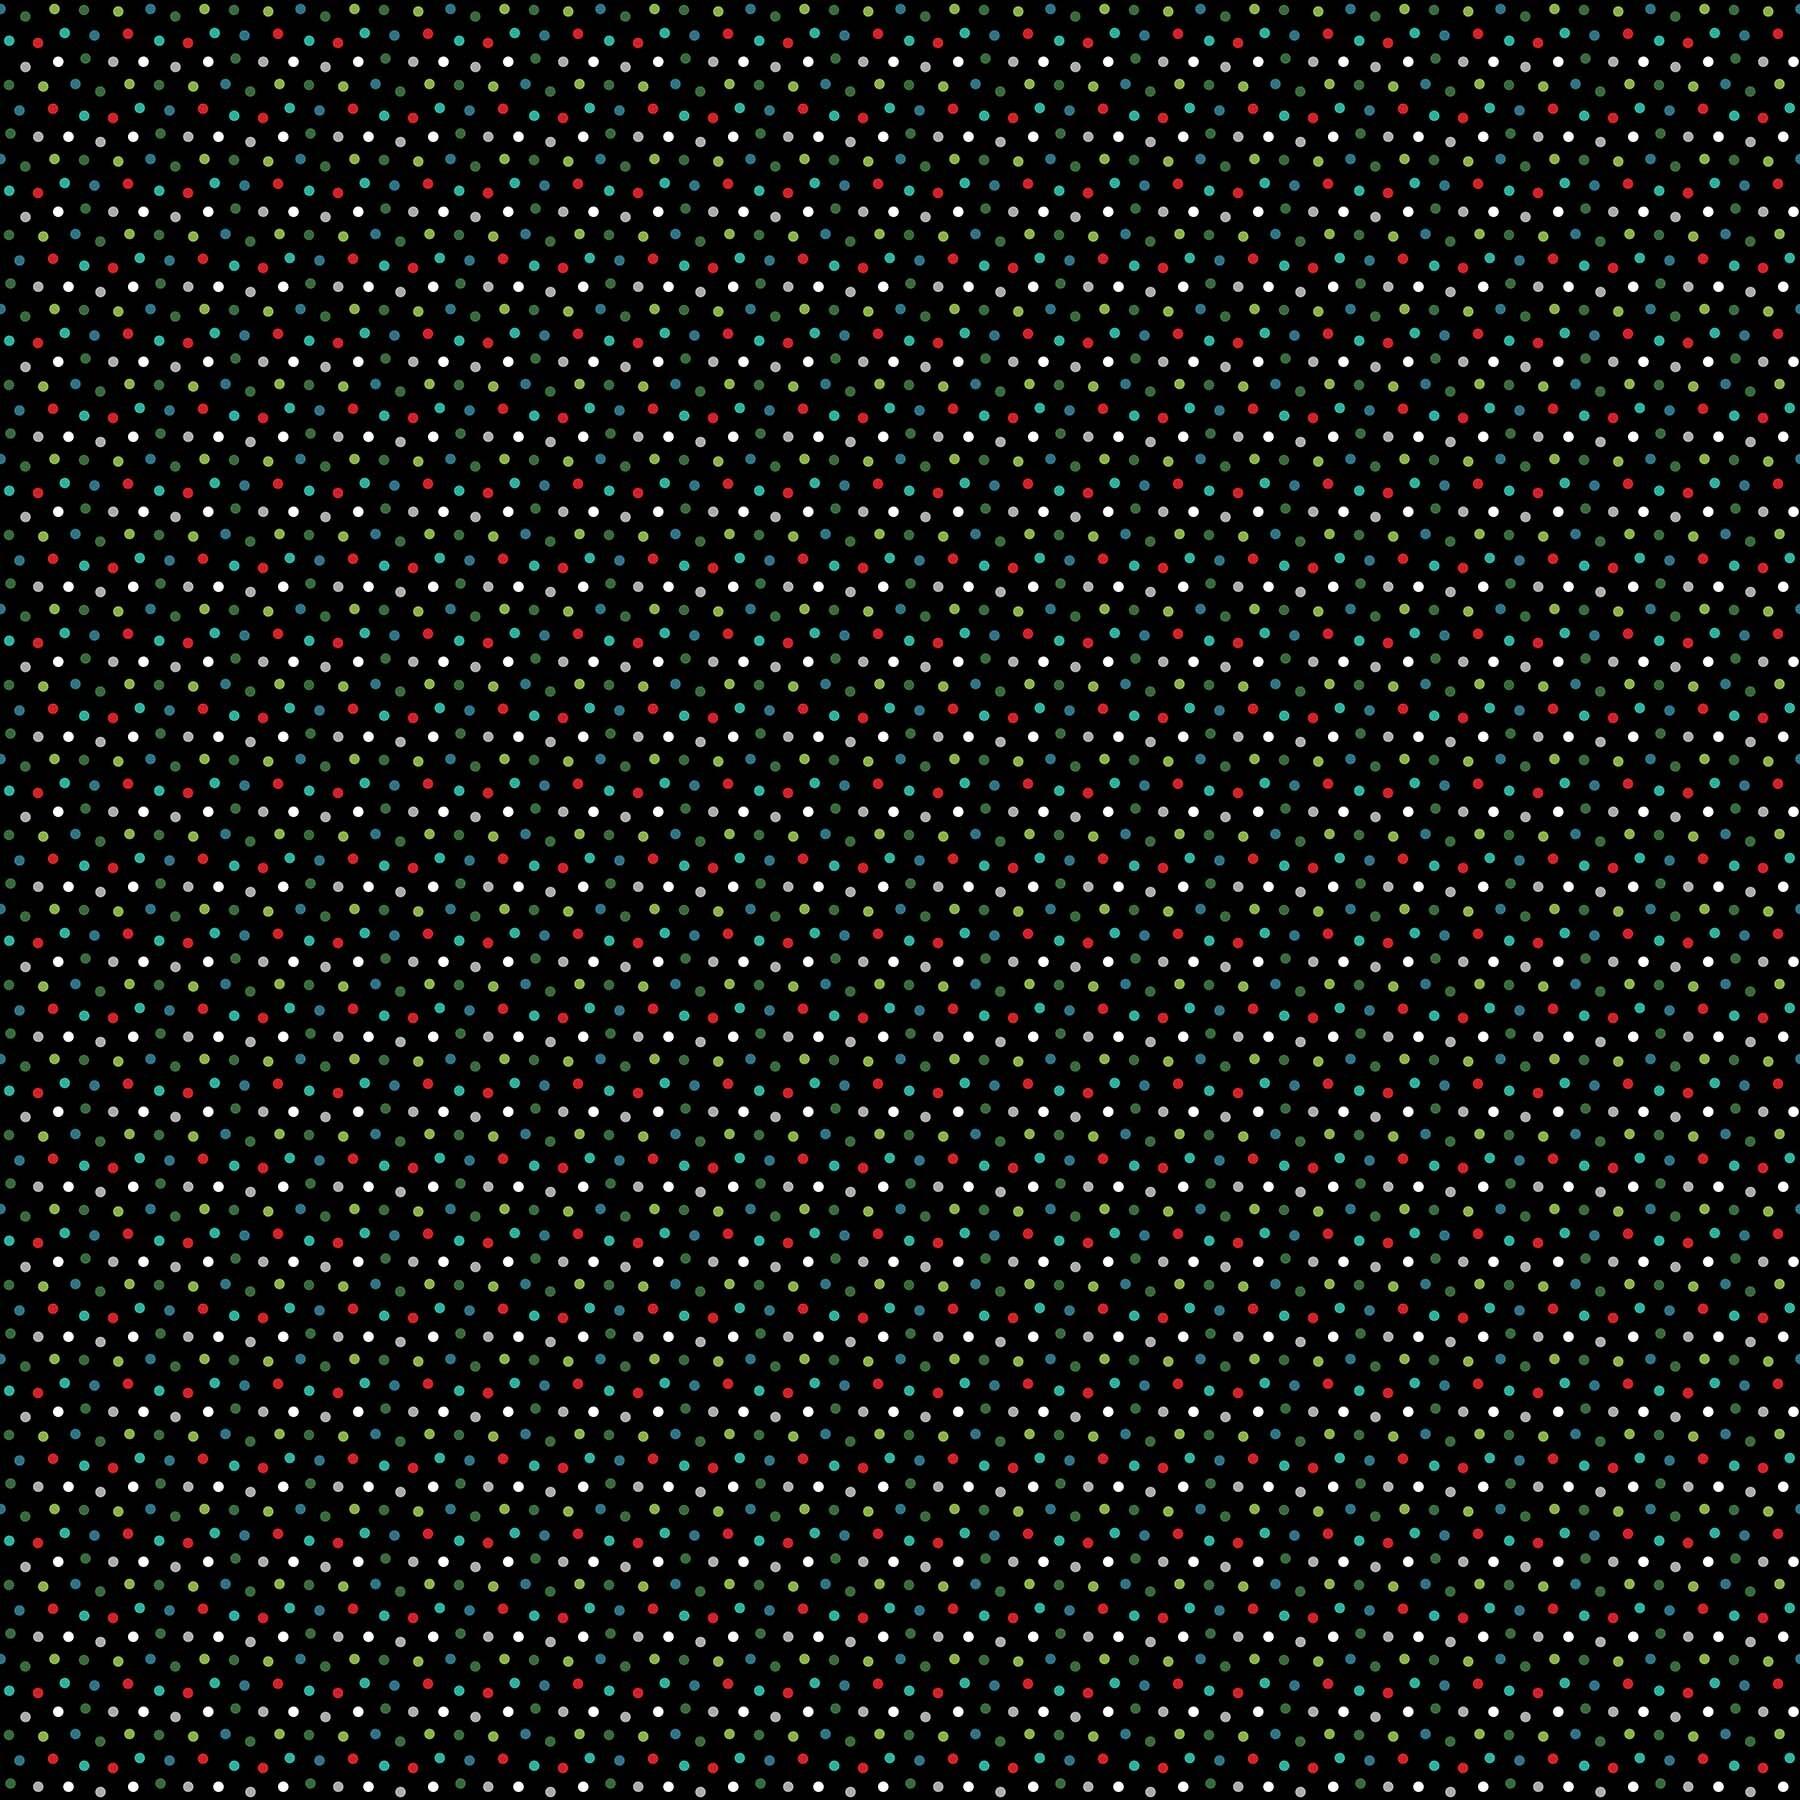 Santa Paws - Polka Dots on Black - 1/2m cut 58031